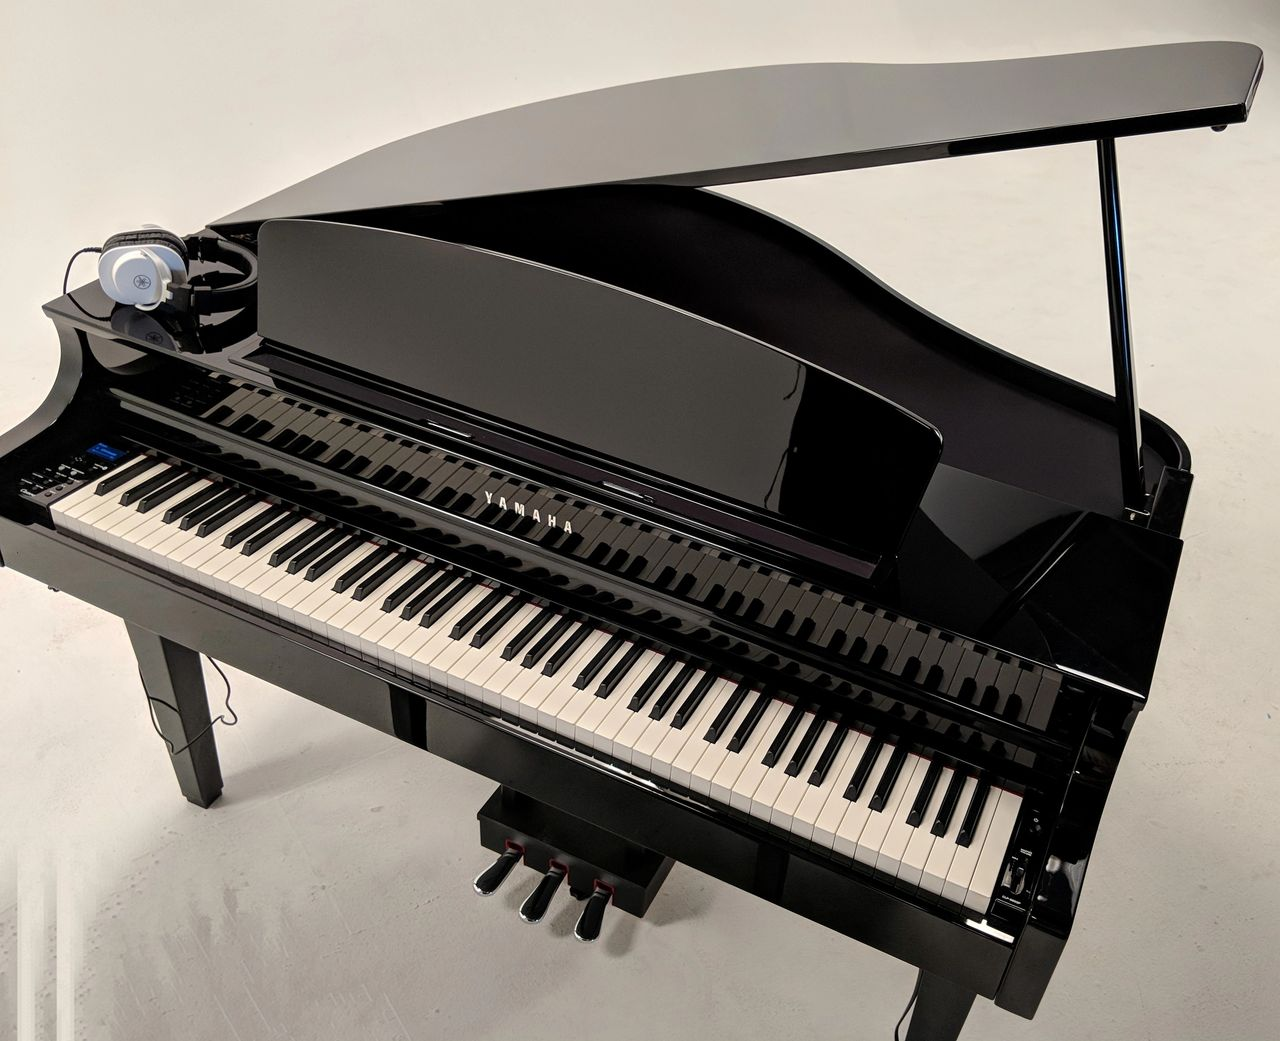 Yamaha CLP-765 digital grand piano